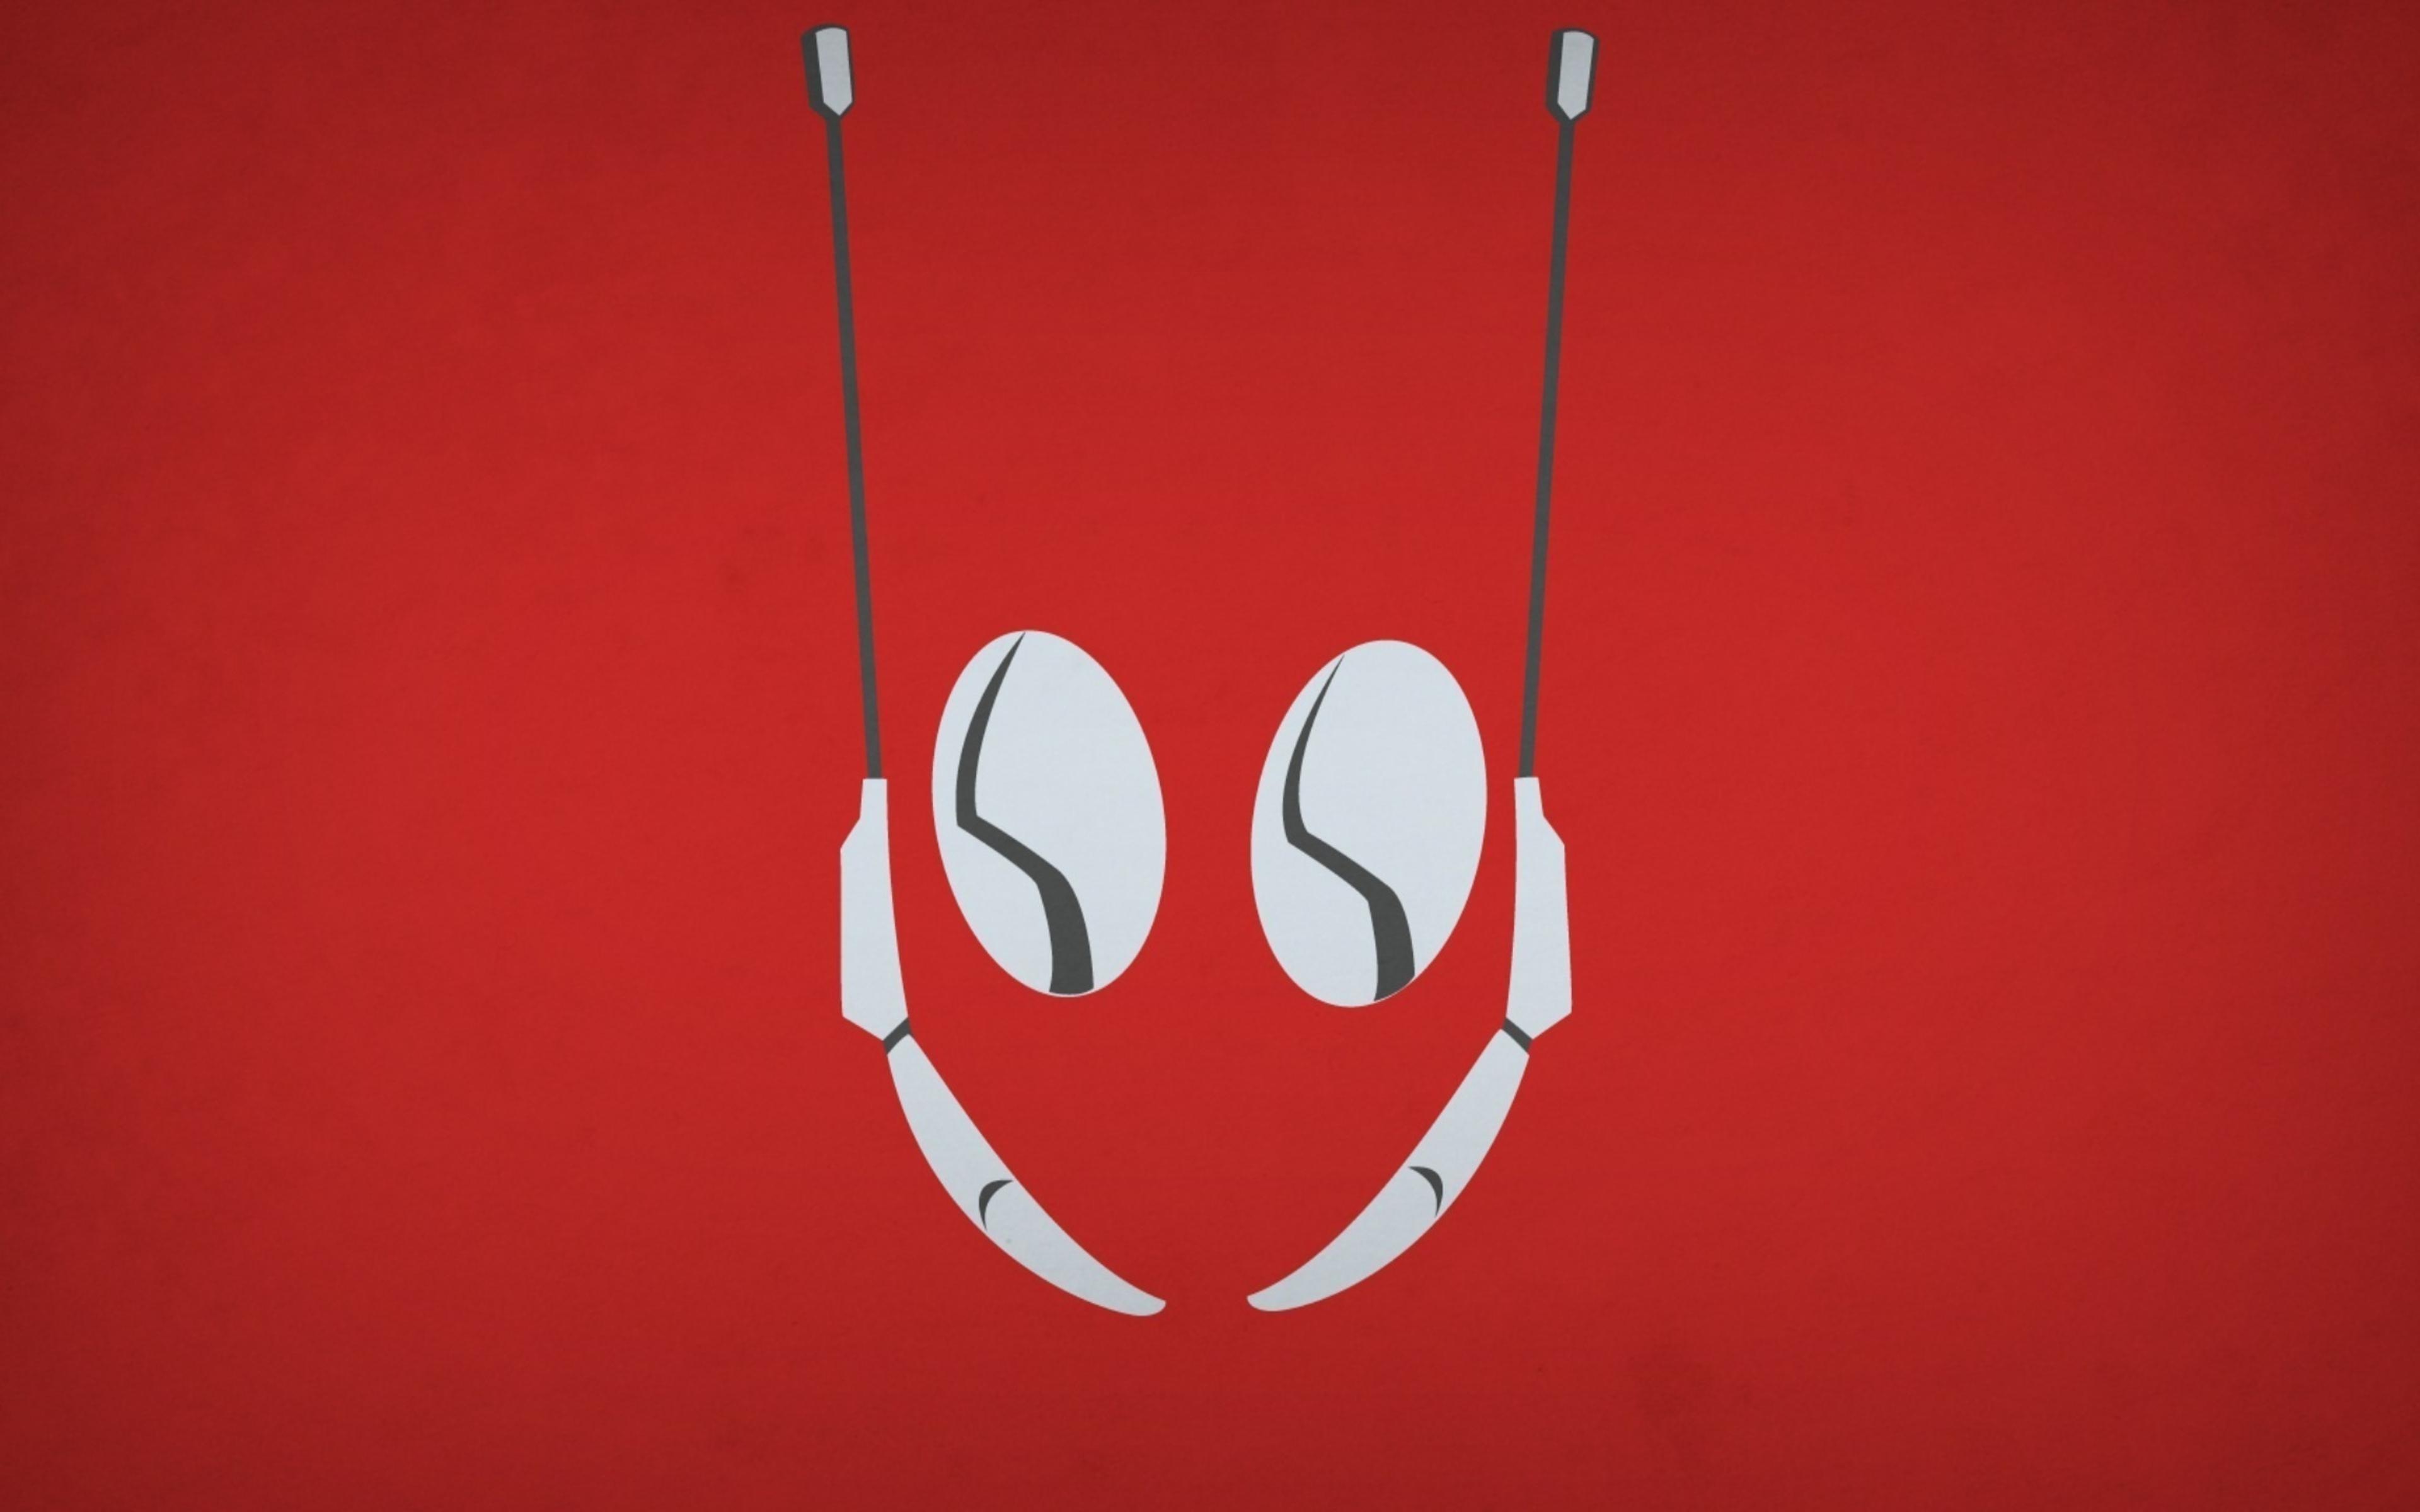 antman-abstract-art.jpg